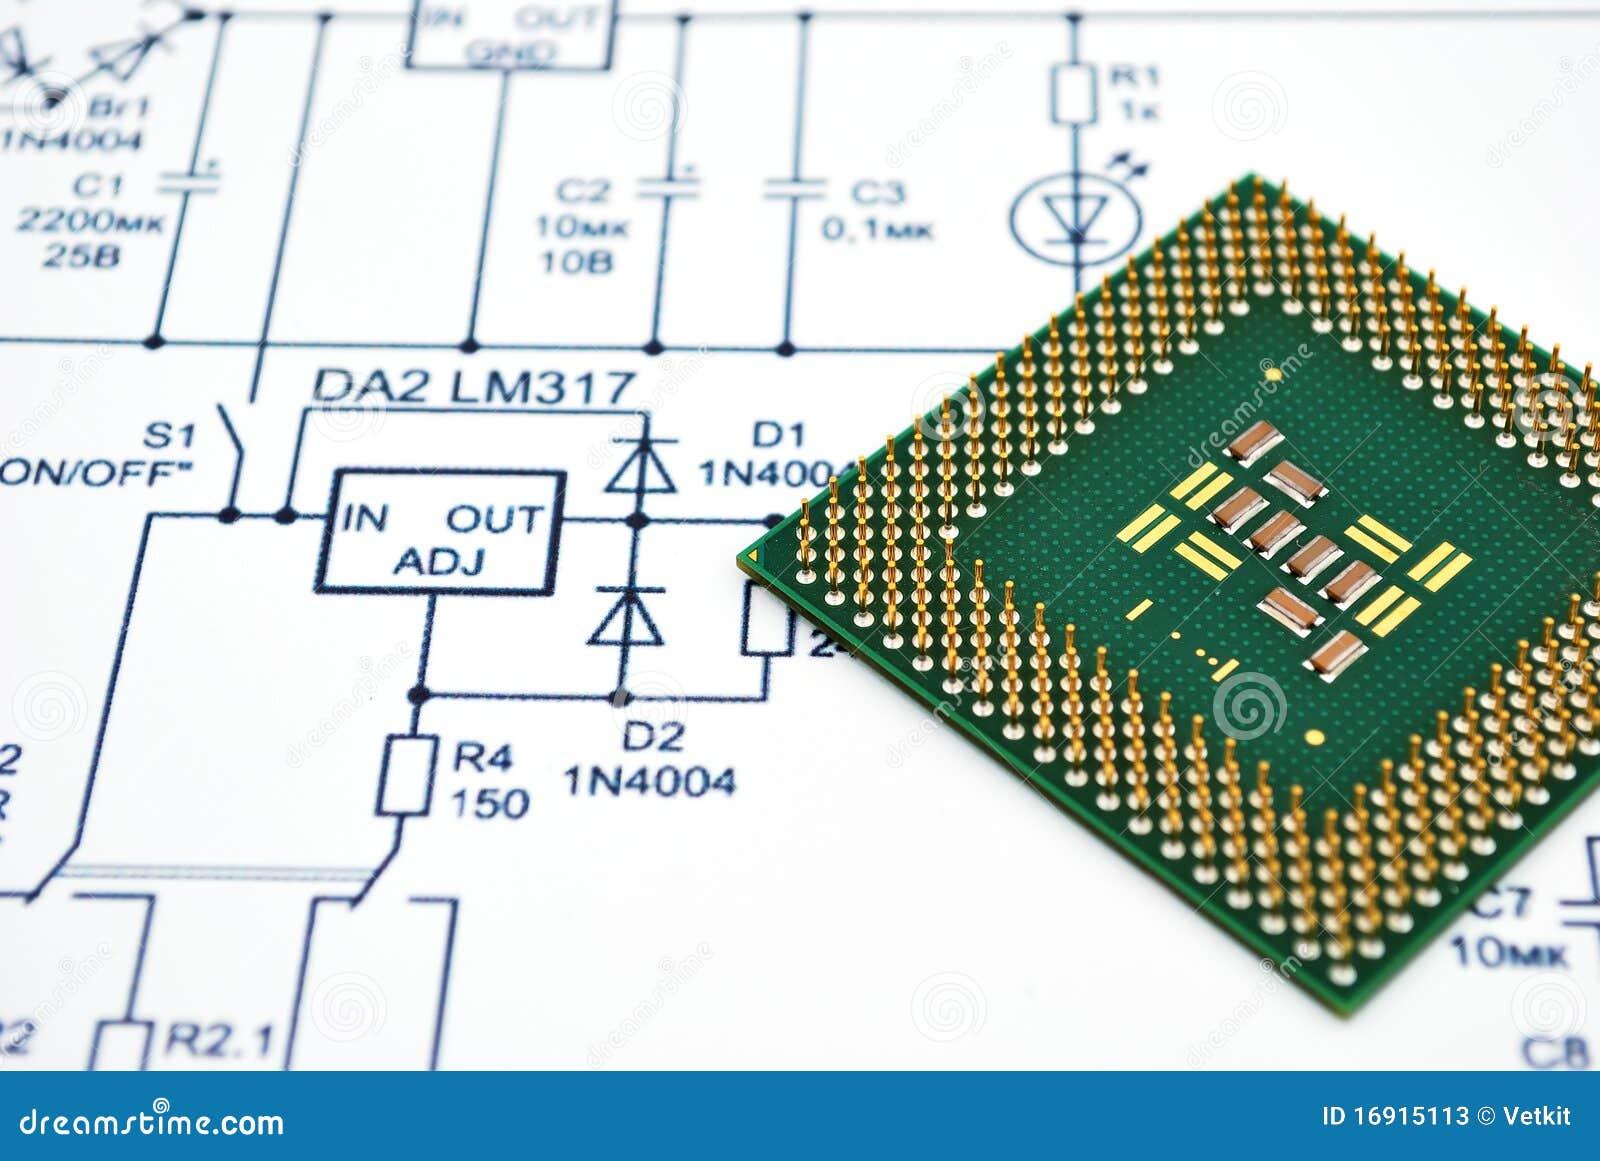 Wiring diagram and cpu stock photos image